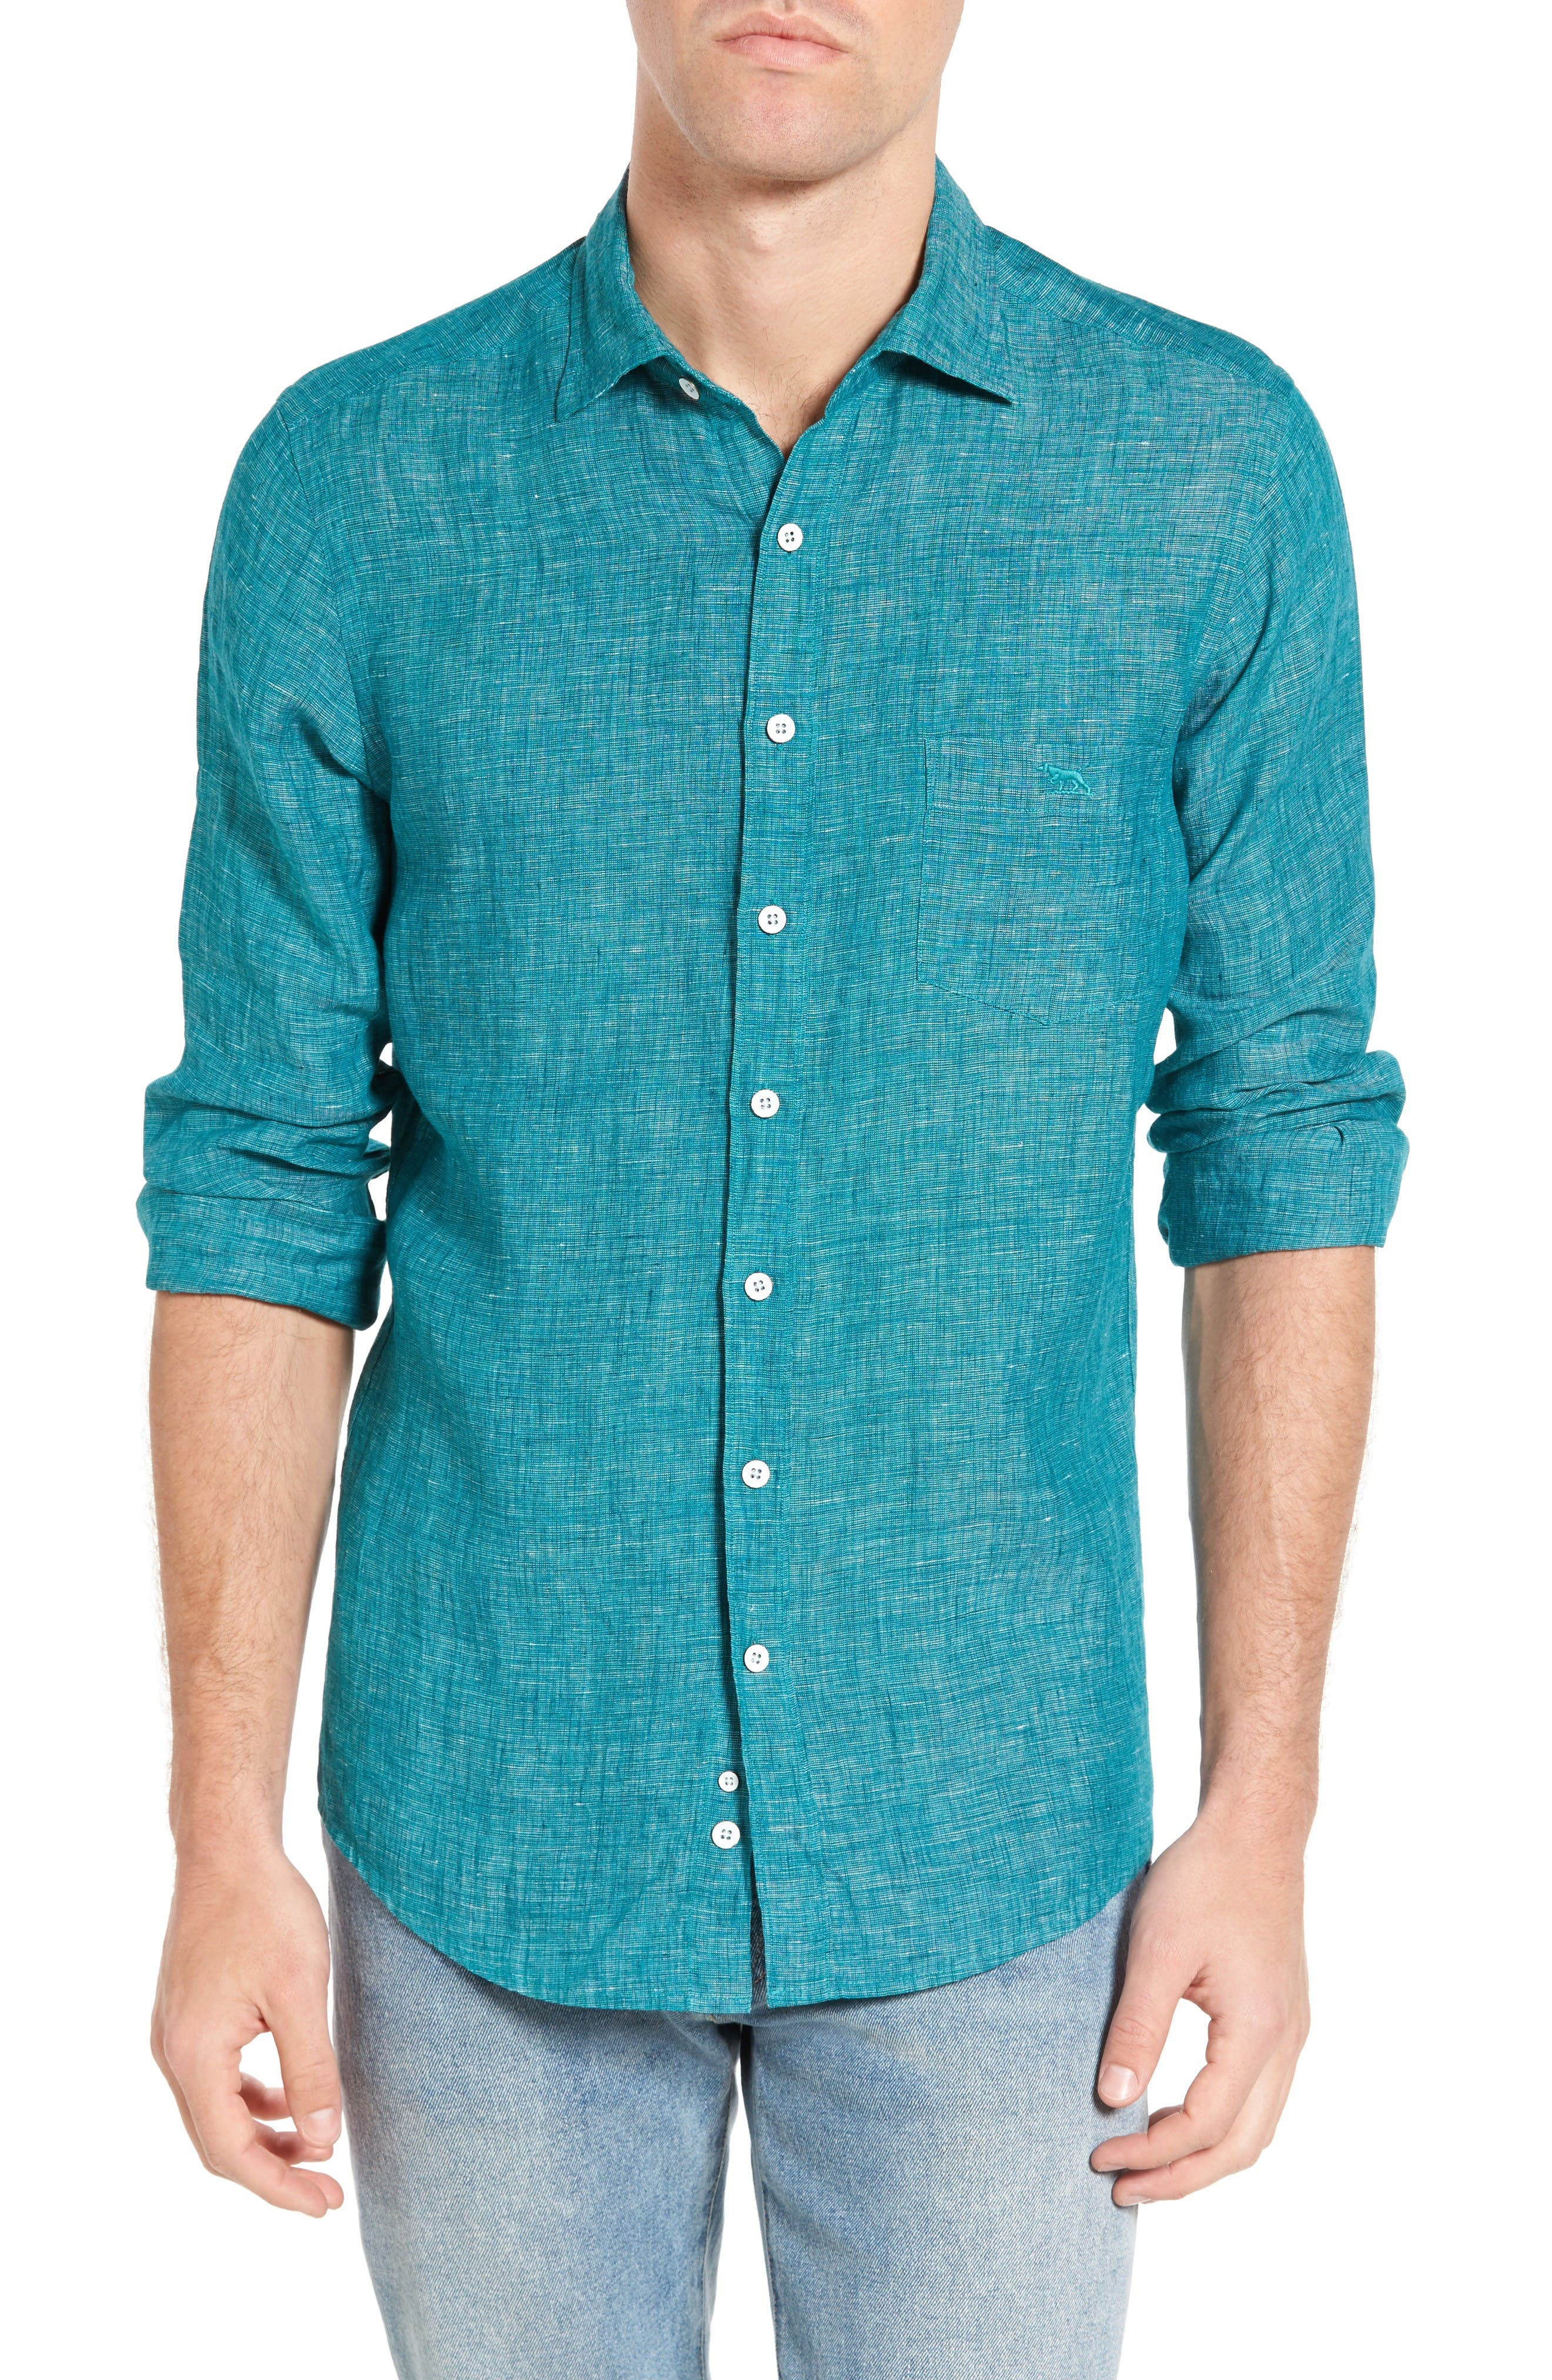 Alternate Image 1 Selected - Rodd & Gunn Norsewood Sports Fit Linen Sport Shirt